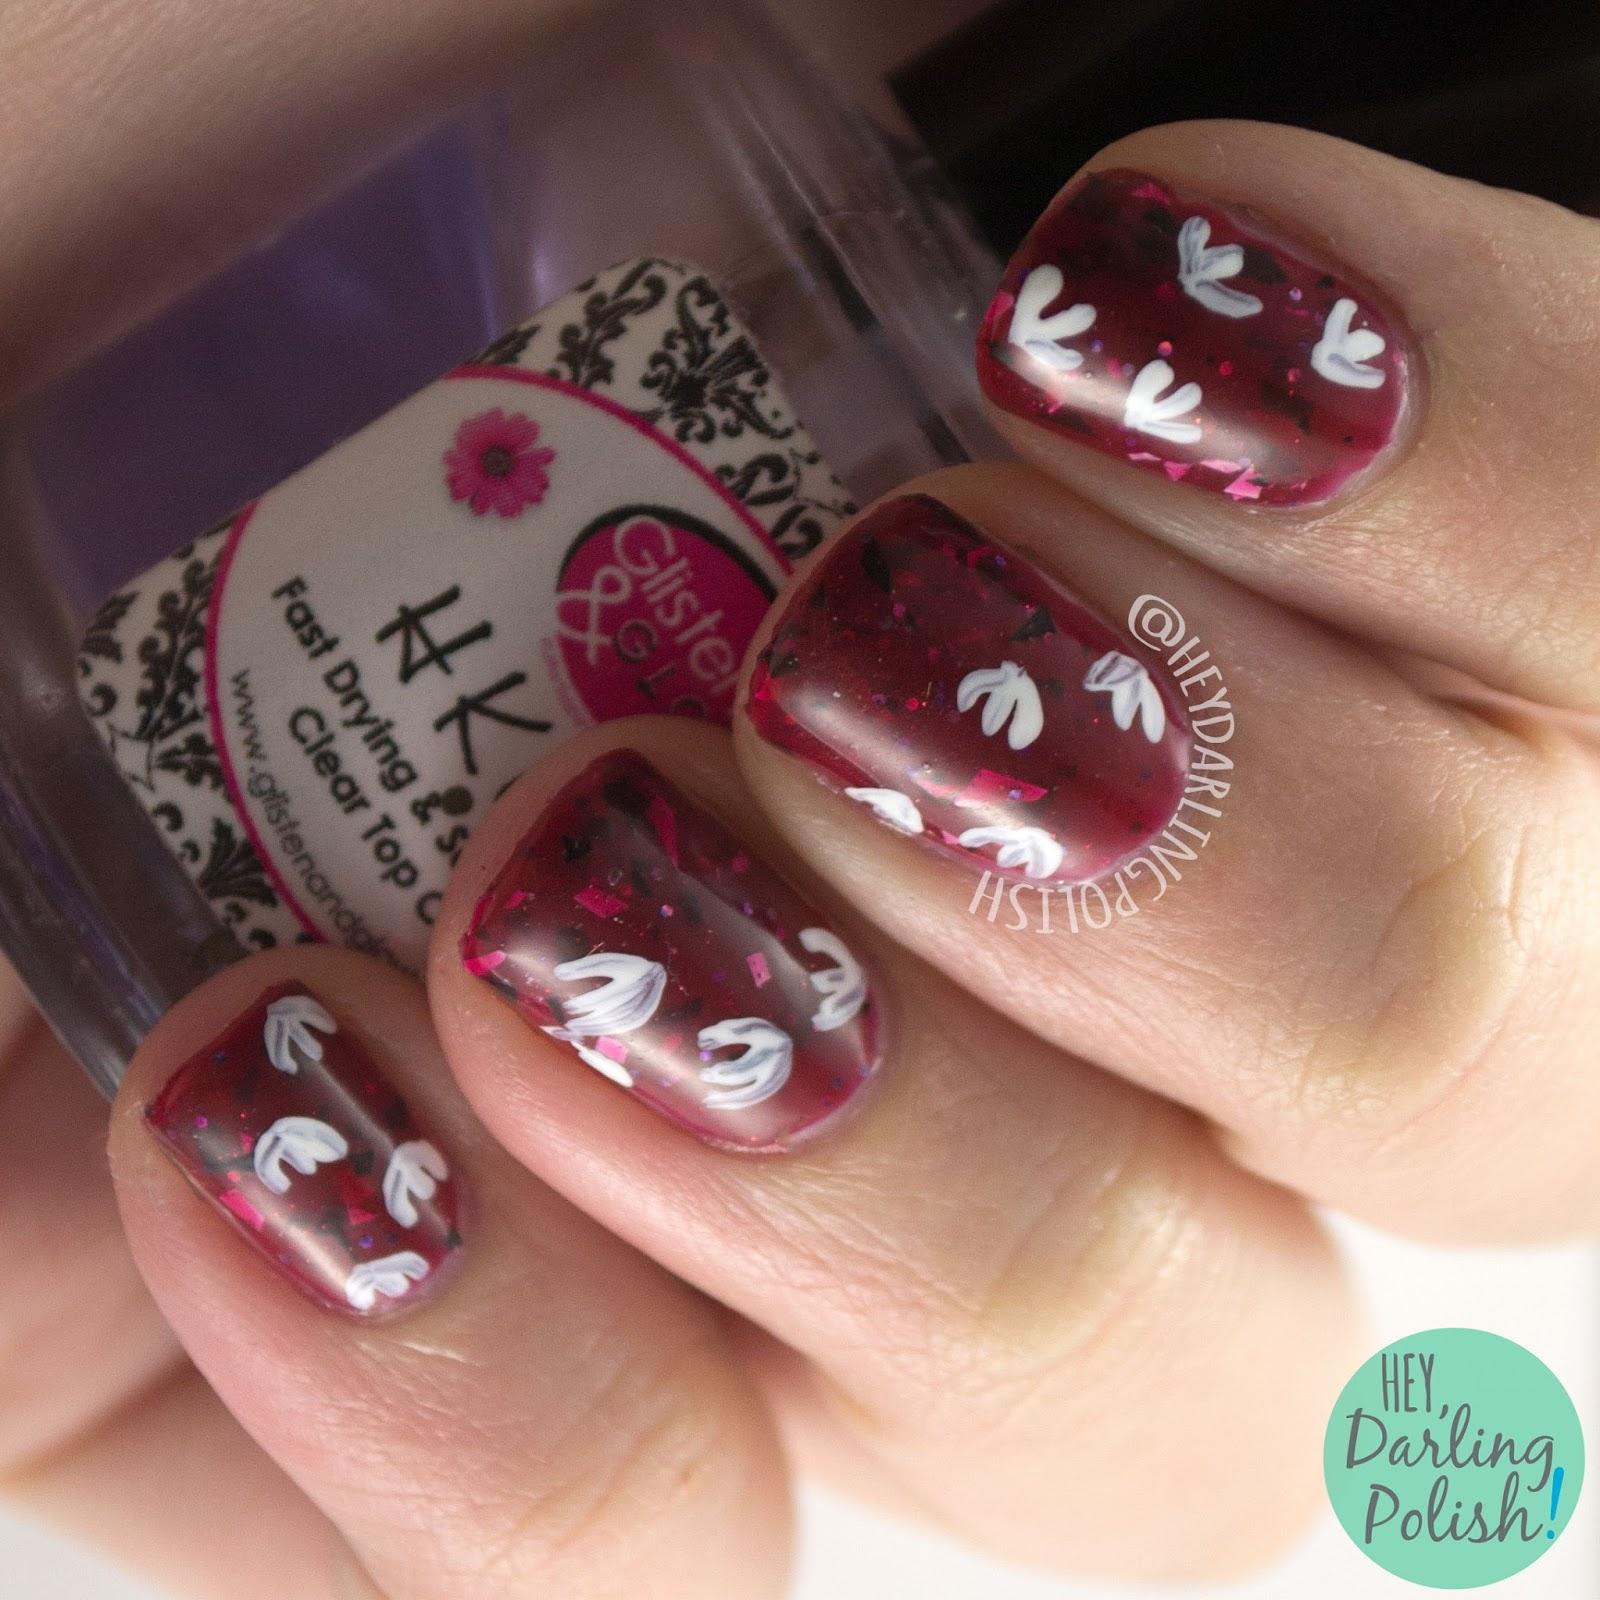 nails, nail art, nail polish, jurassic park, dinosaur, hey darling polish, lucky 13 lacquer, red, 2015 cnt 31 day challenge